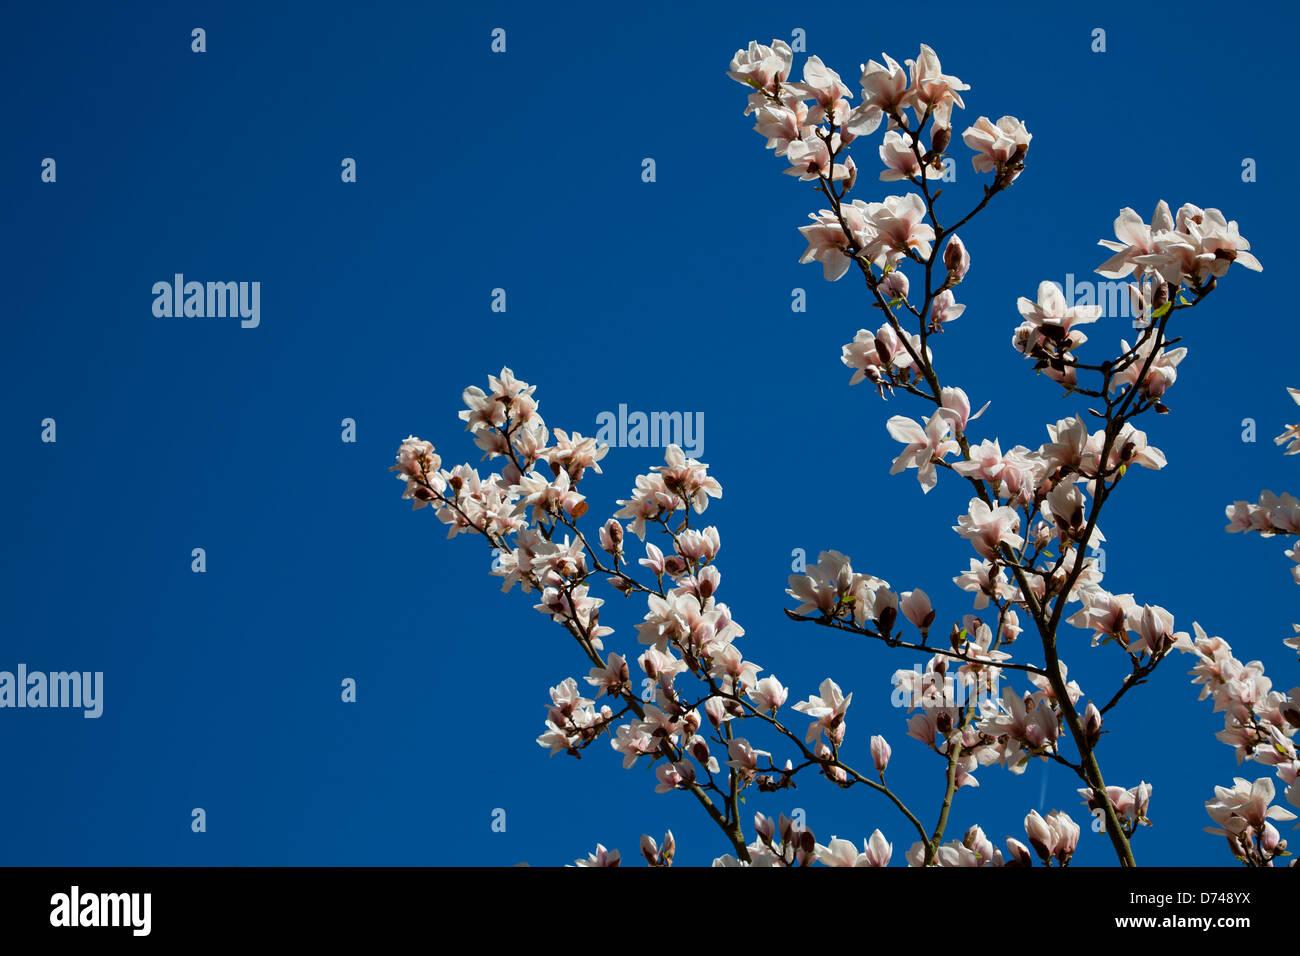 Saucer magnolia tree at Kew Gardens in London, UK - Stock Image